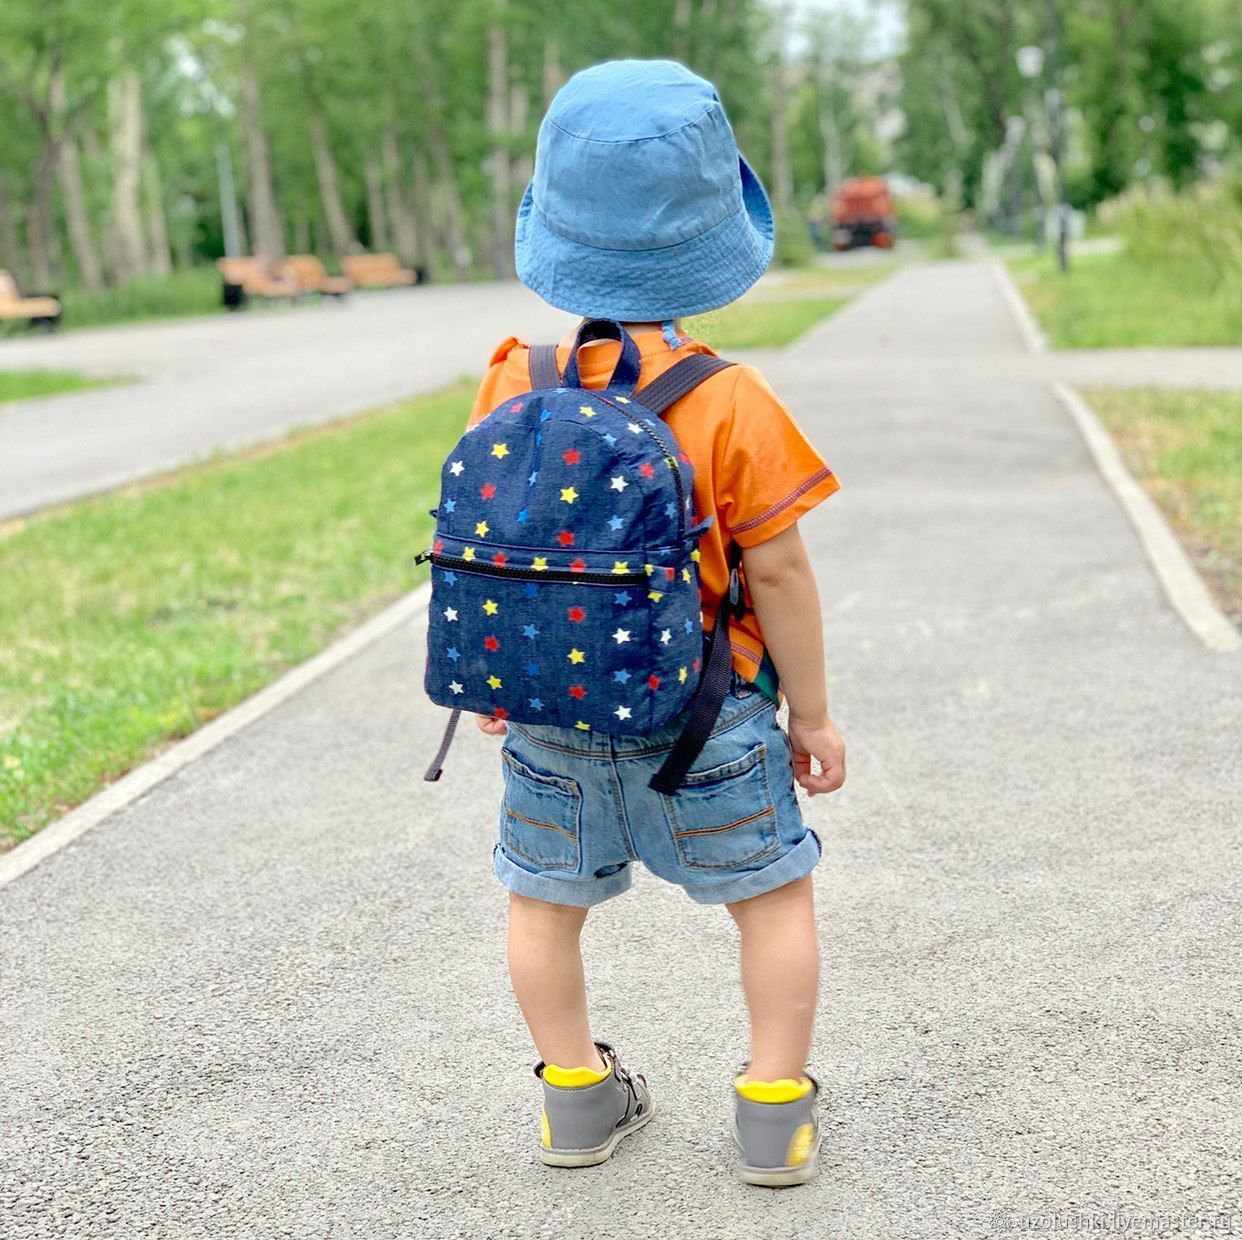 Детский рюкзак из денима Звезды, размер S, Сумки, Магнитогорск, Фото №1